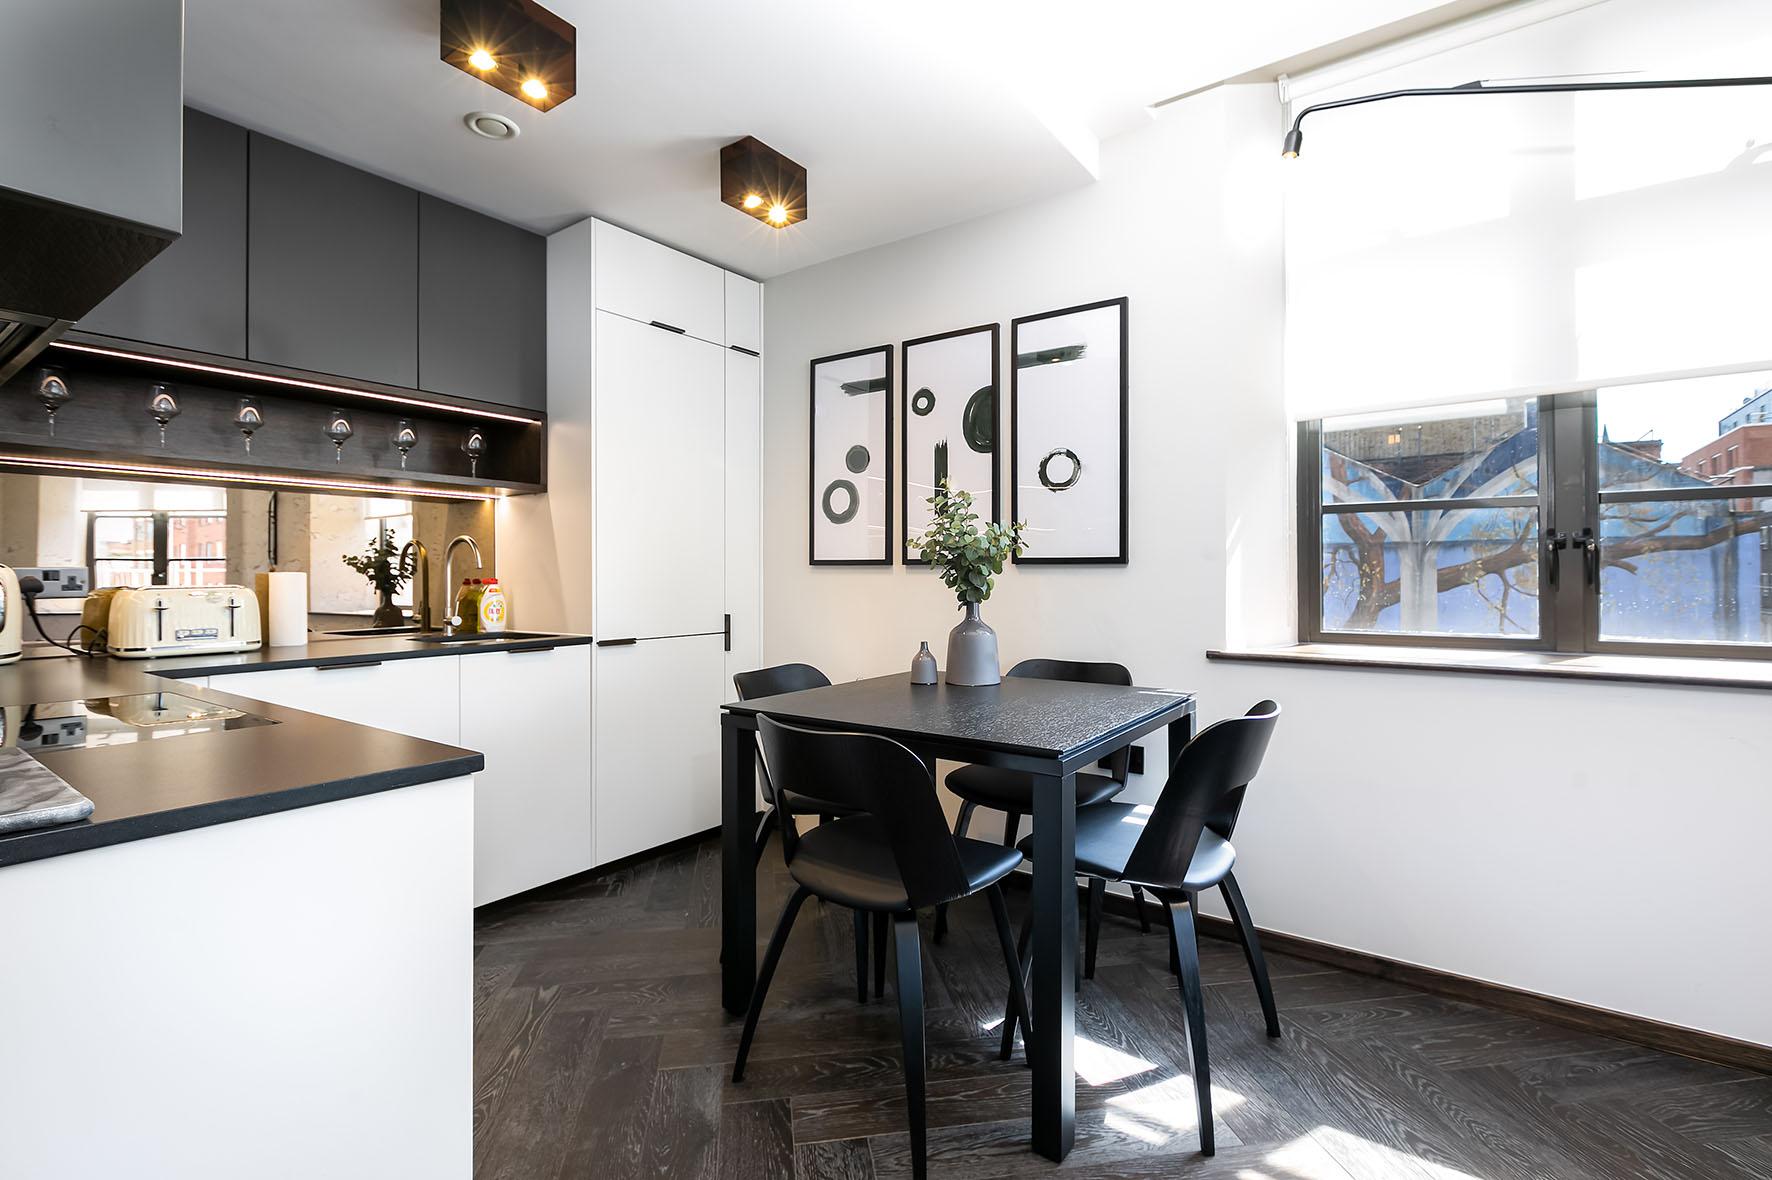 Lovelydays luxury service apartment rental - London - Soho - Oxford Street IV - Lovelysuite - 2 bedrooms - 2 bathrooms - Luxury kitchen - 8d278bff44ce - Lovelydays